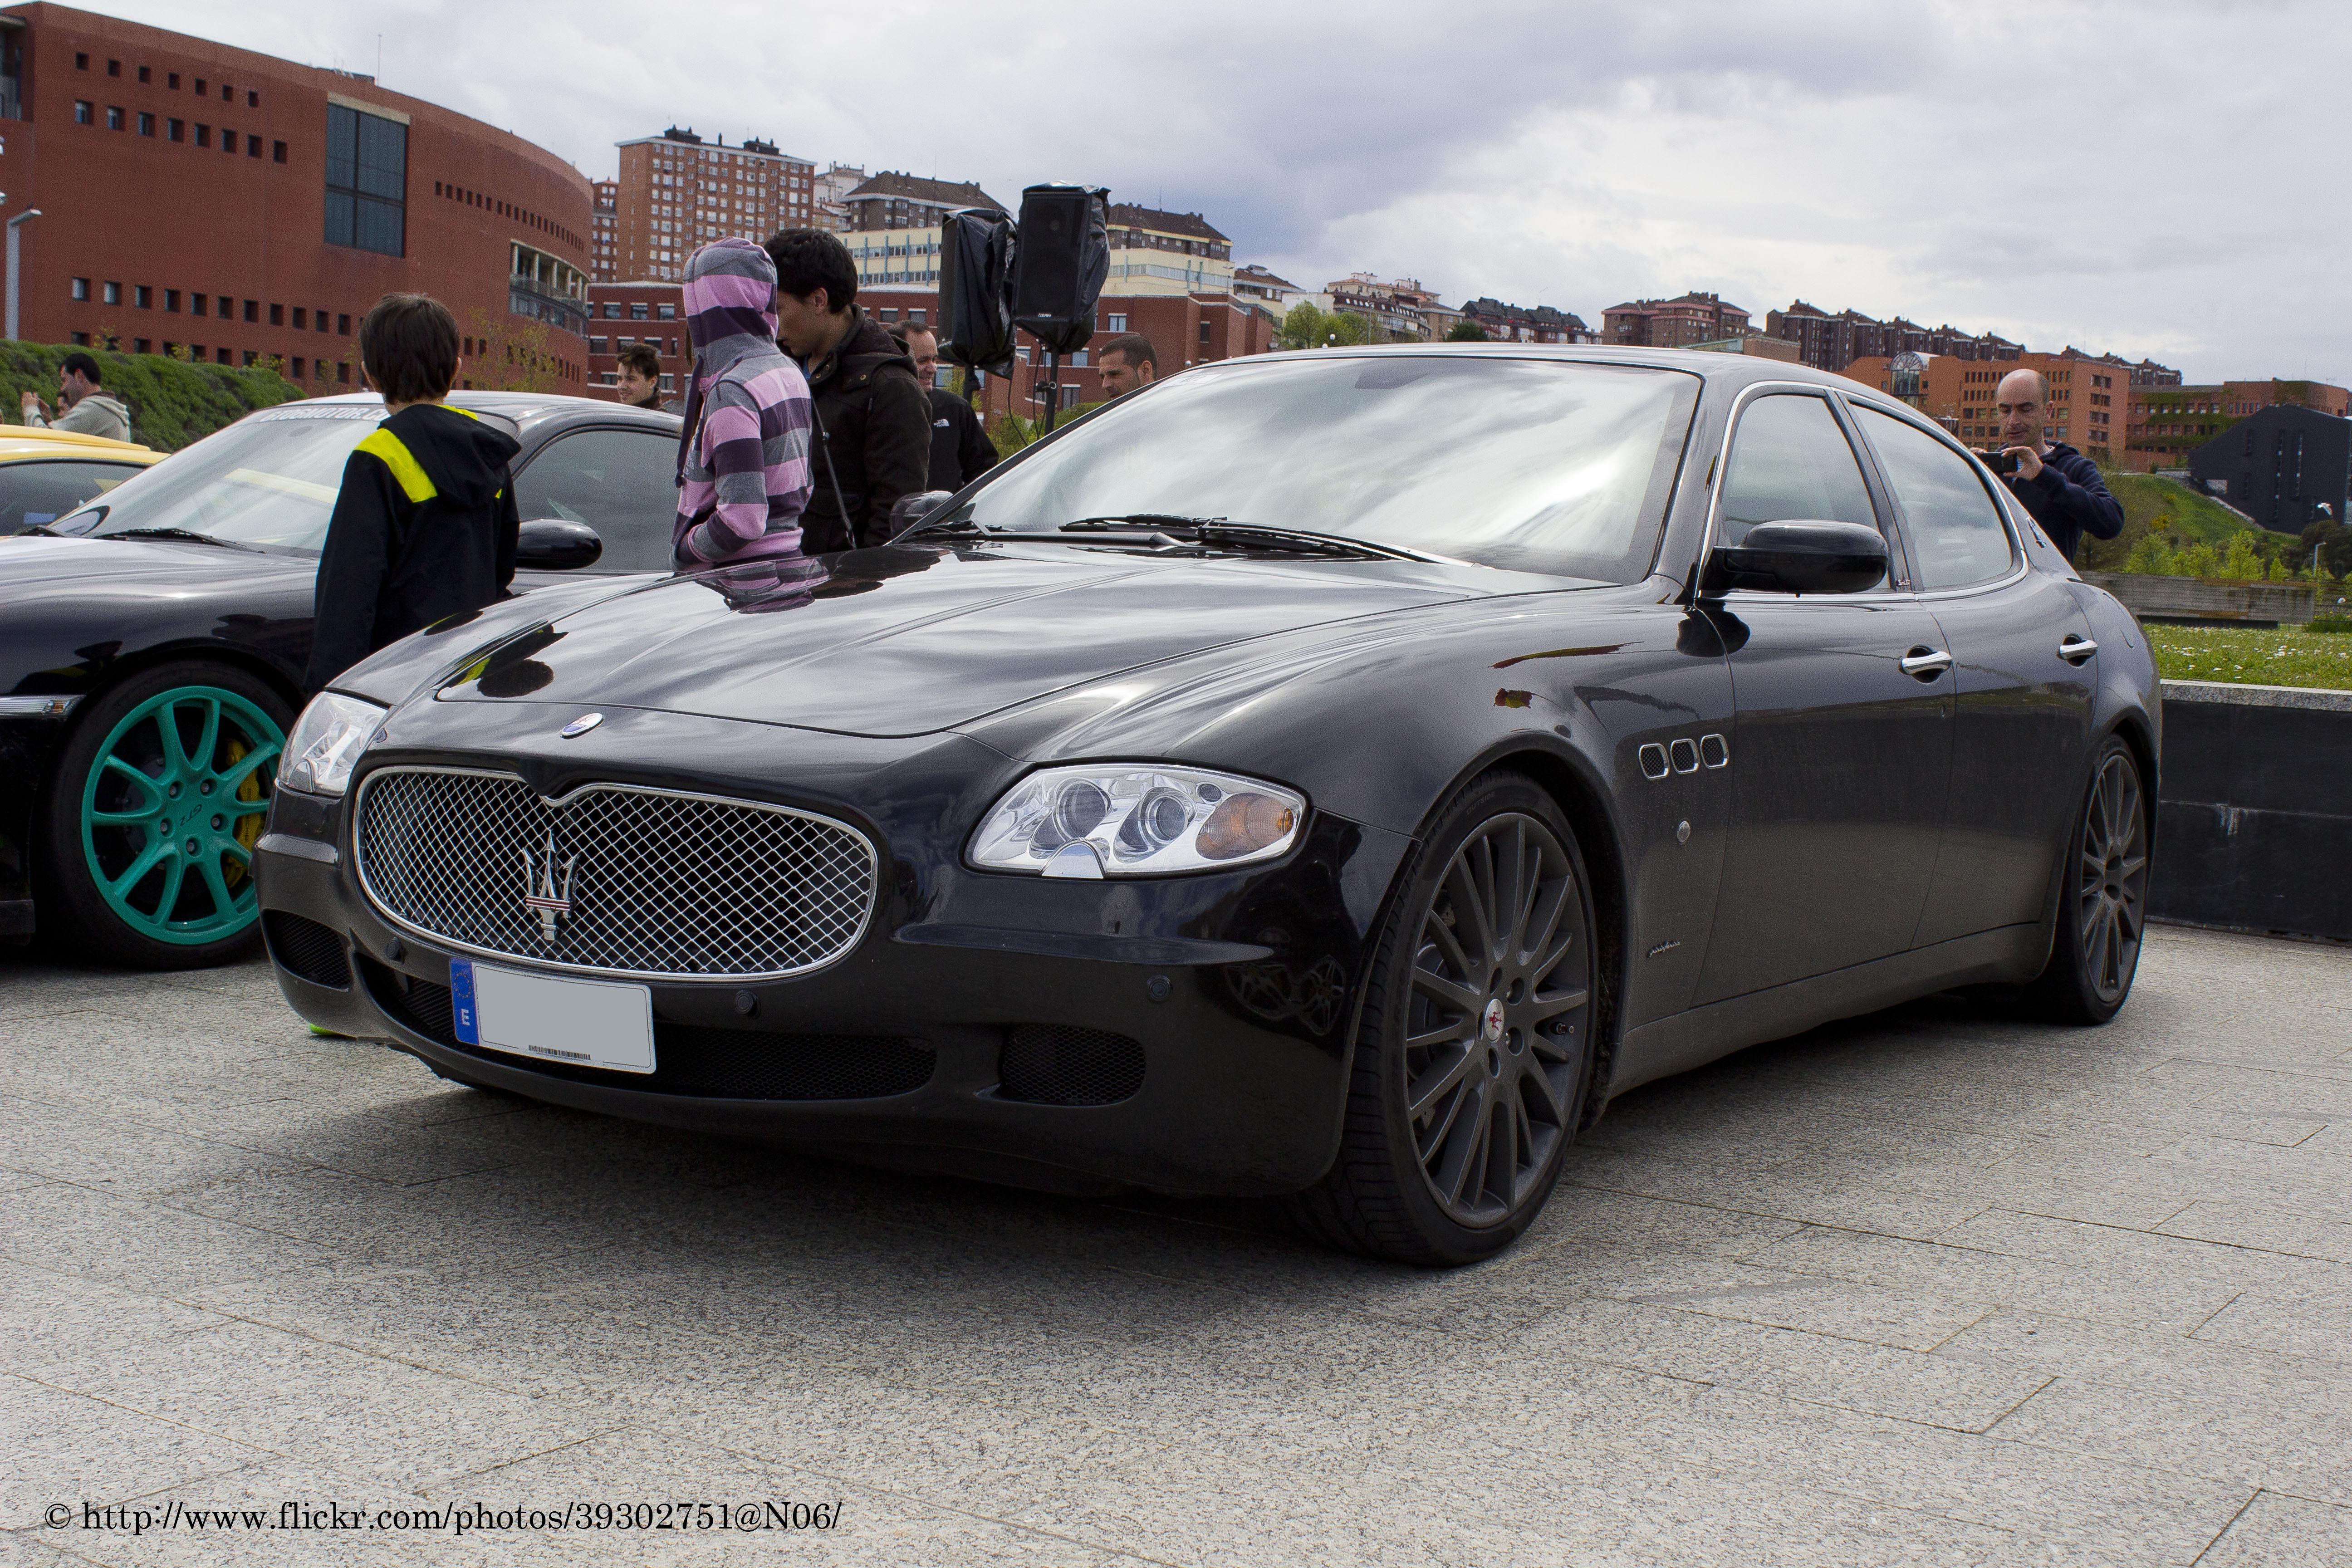 https://upload.wikimedia.org/wikipedia/commons/9/9c/2006_Maserati_Quattroporte_Sport_GT_%287166399306%29.jpg